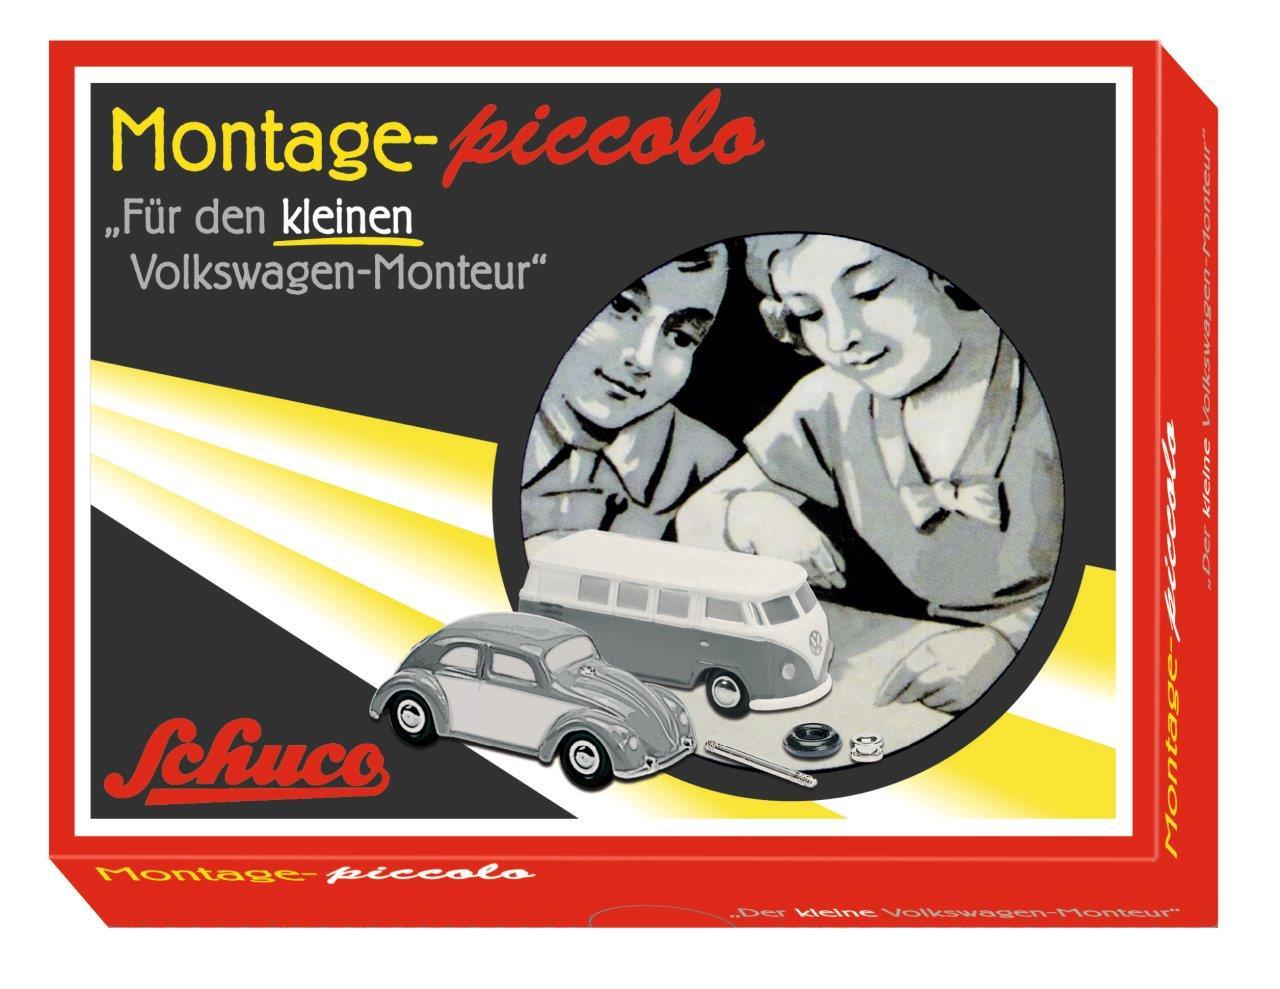 Piccolo Montagekasten VW-Monteur